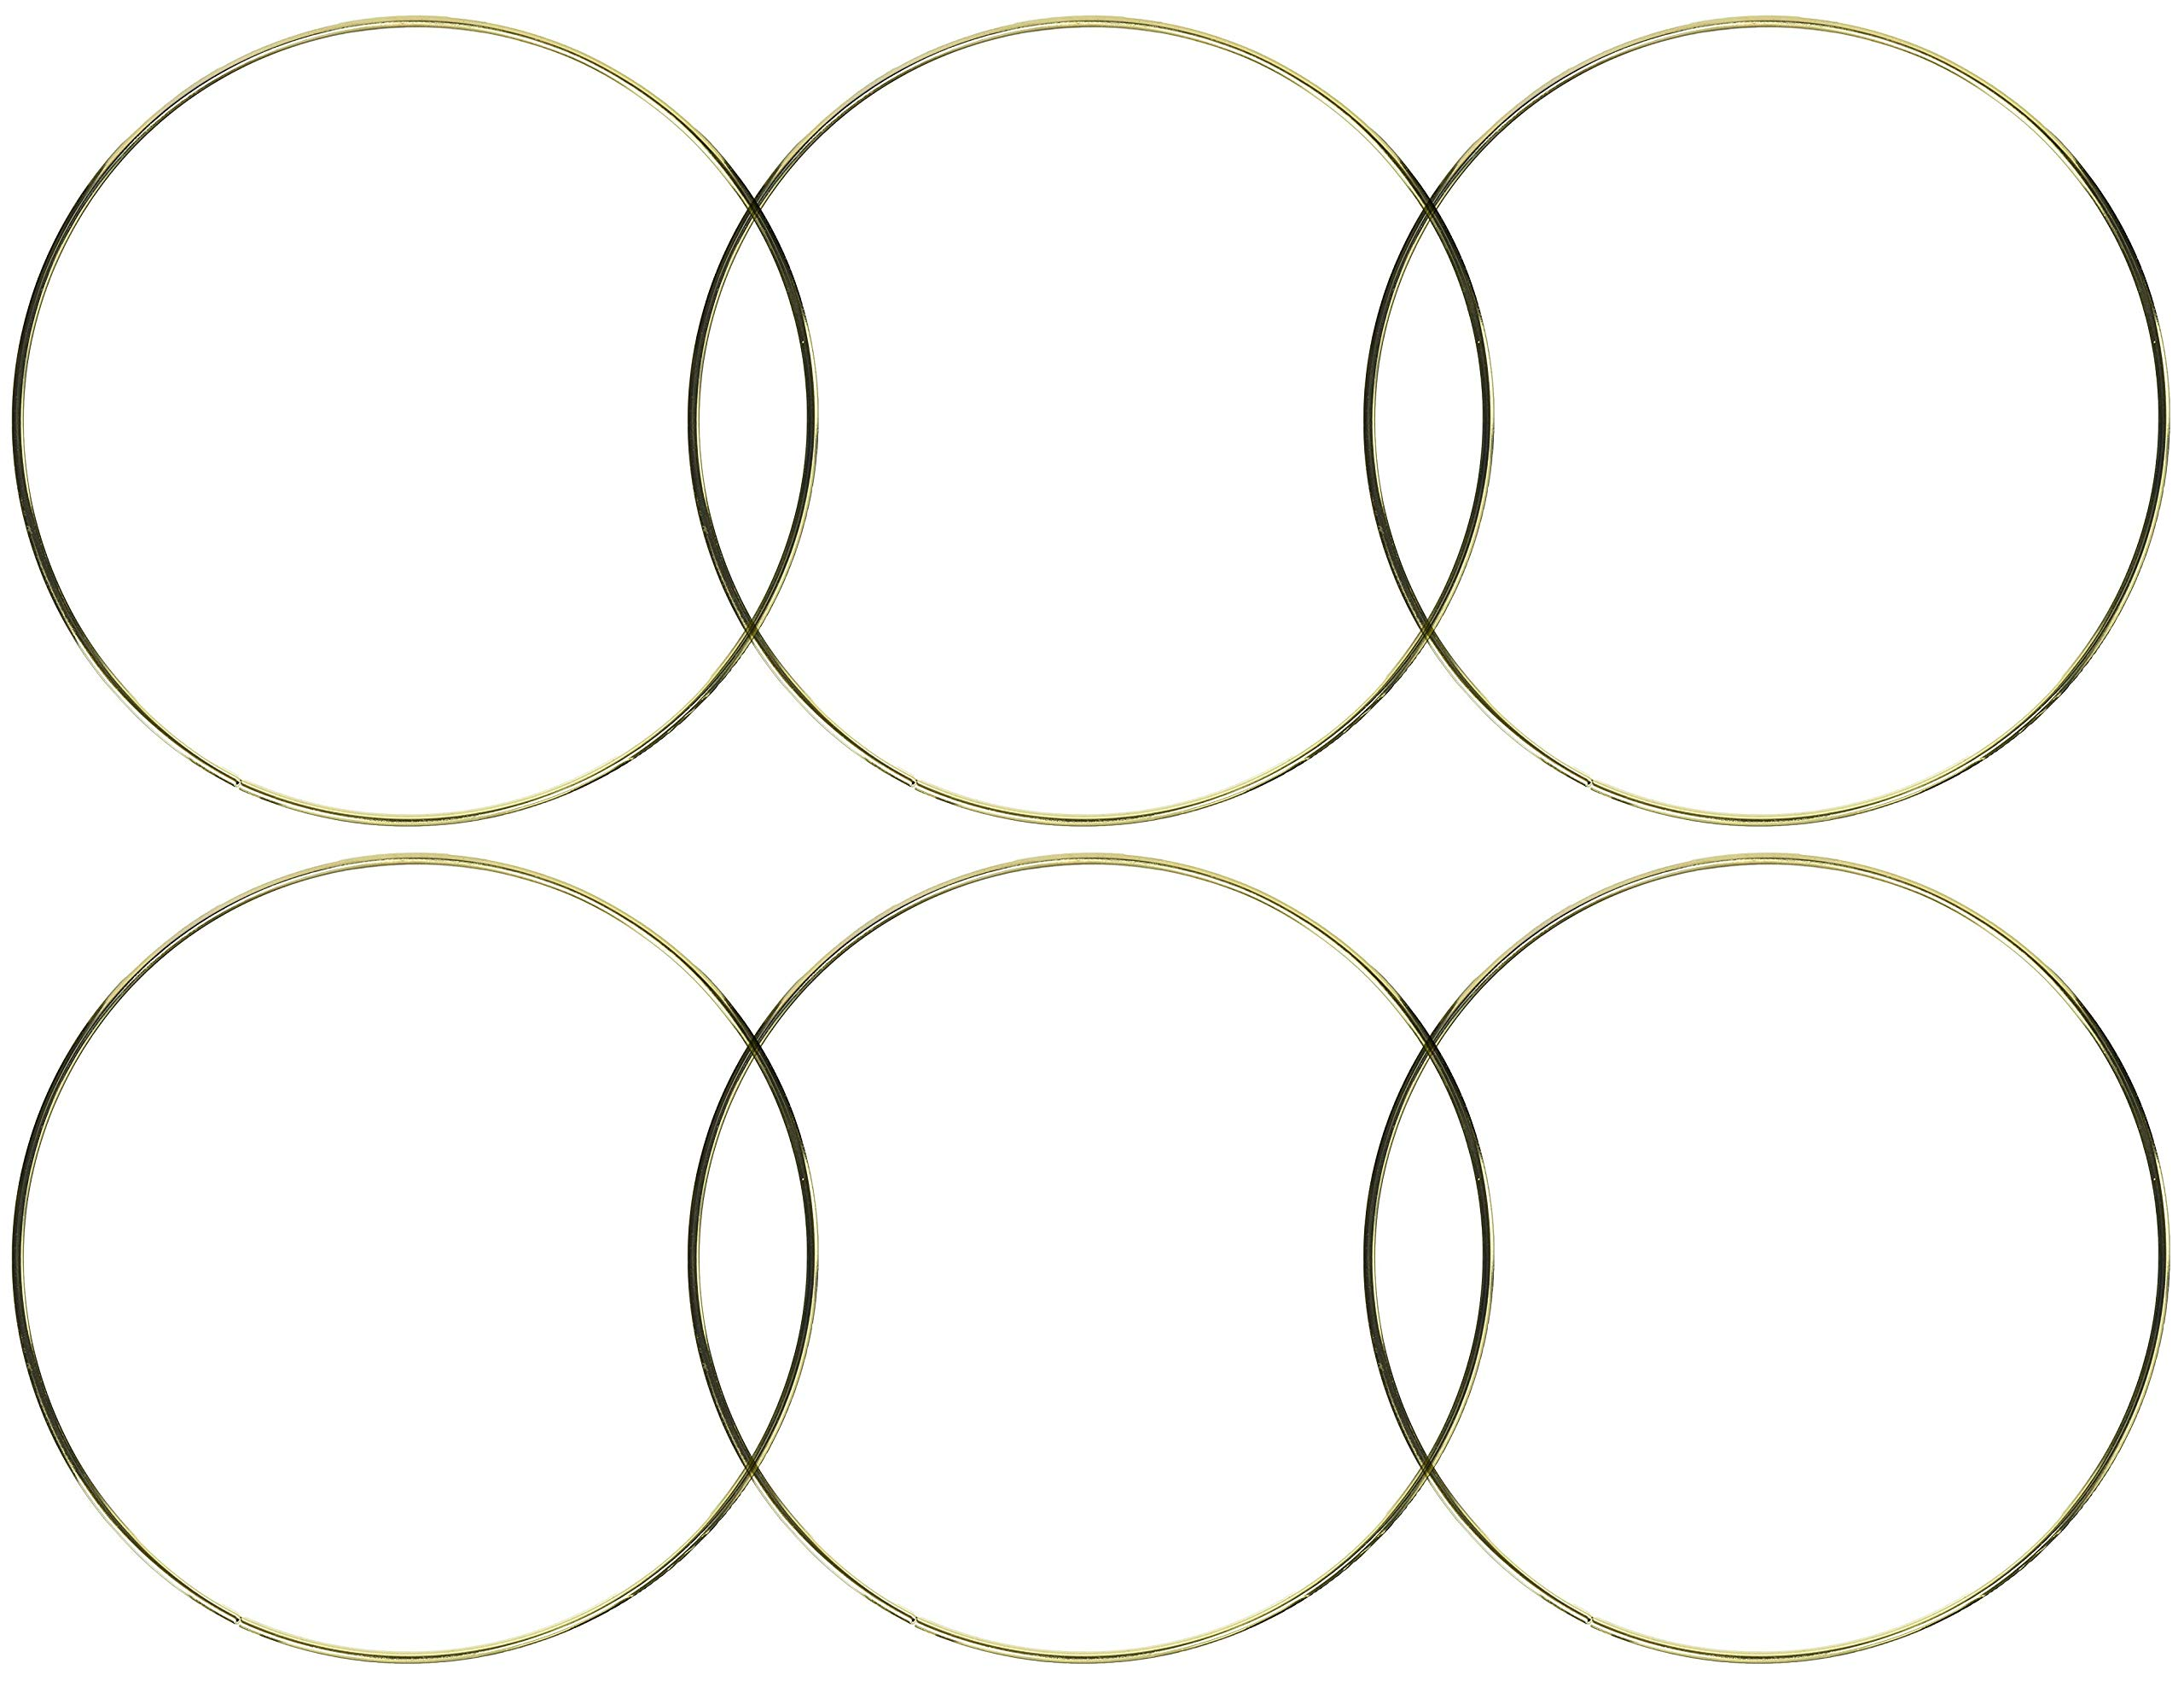 6-Pack - Darice Gold Metal Ring, 12-Inch by Darice (Image #2)